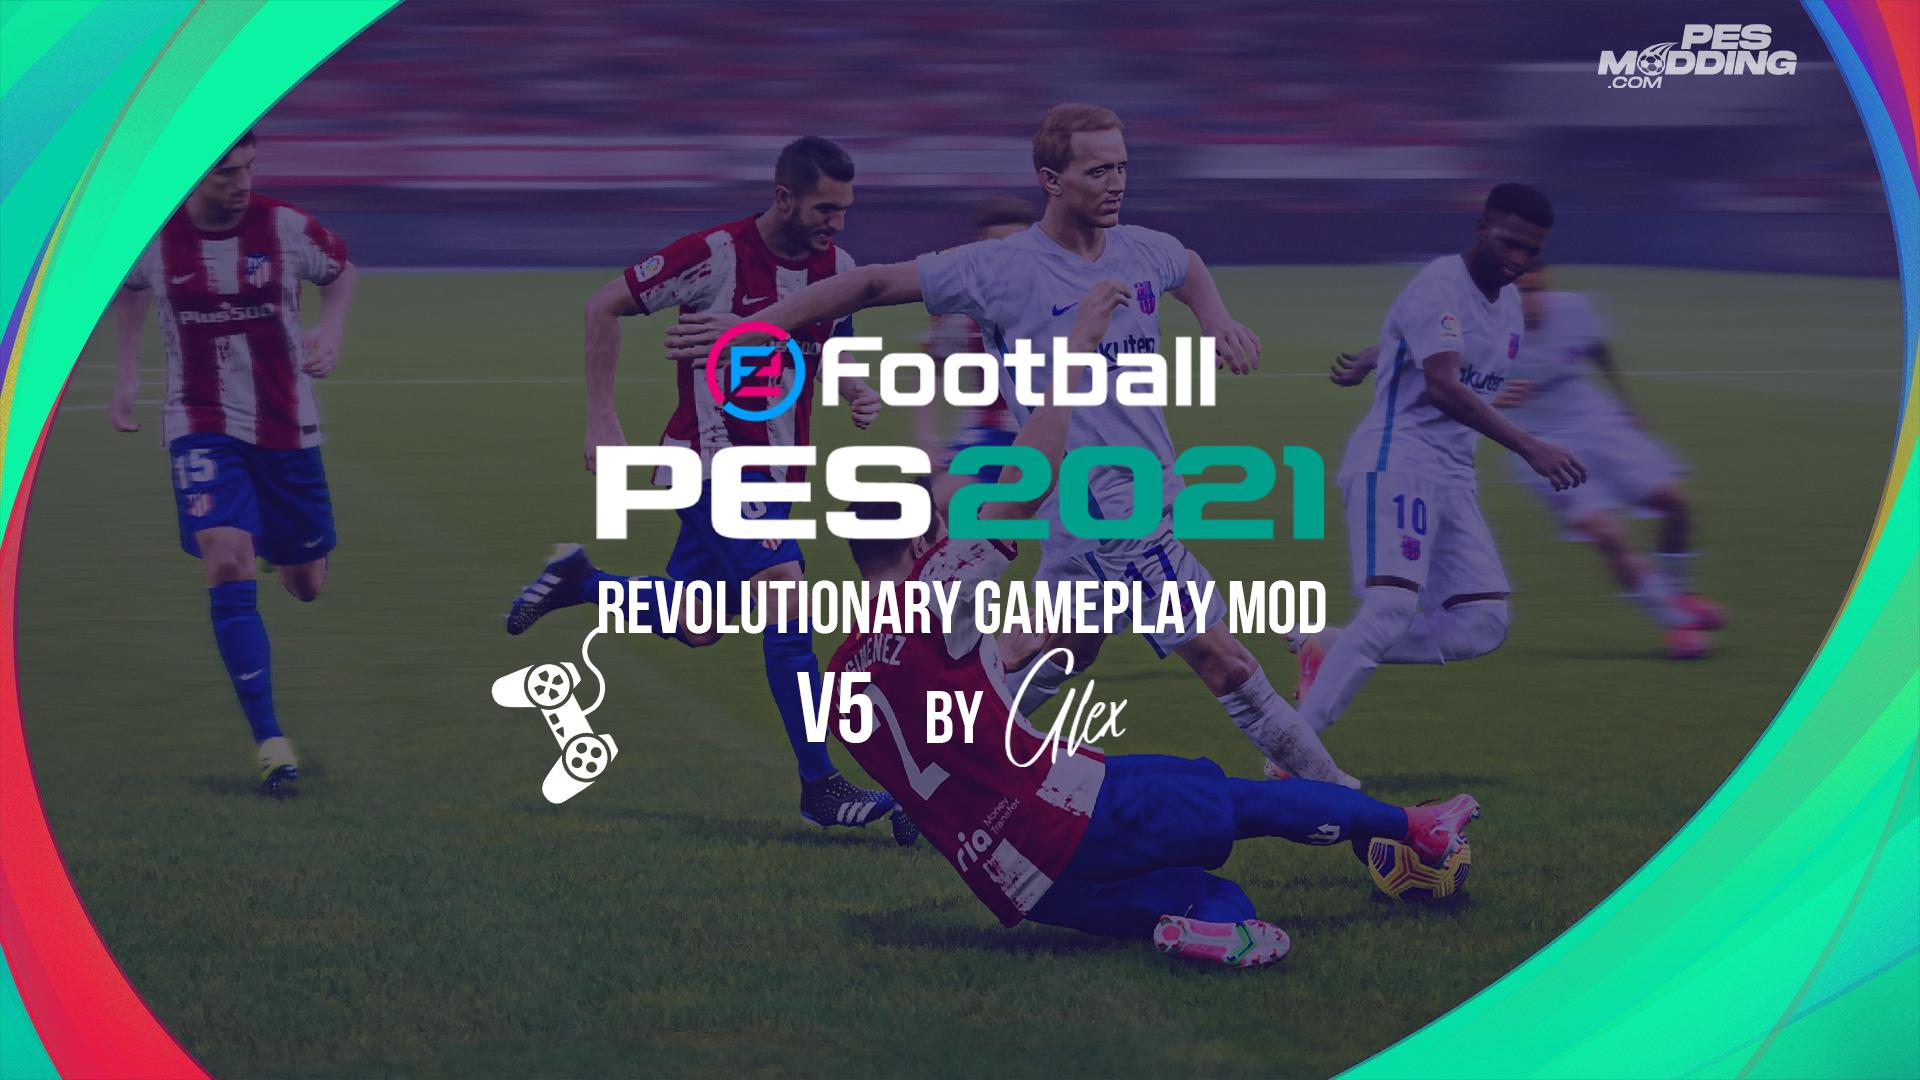 PES 2021 Revolutionary Gameplay Mod by Alex V5